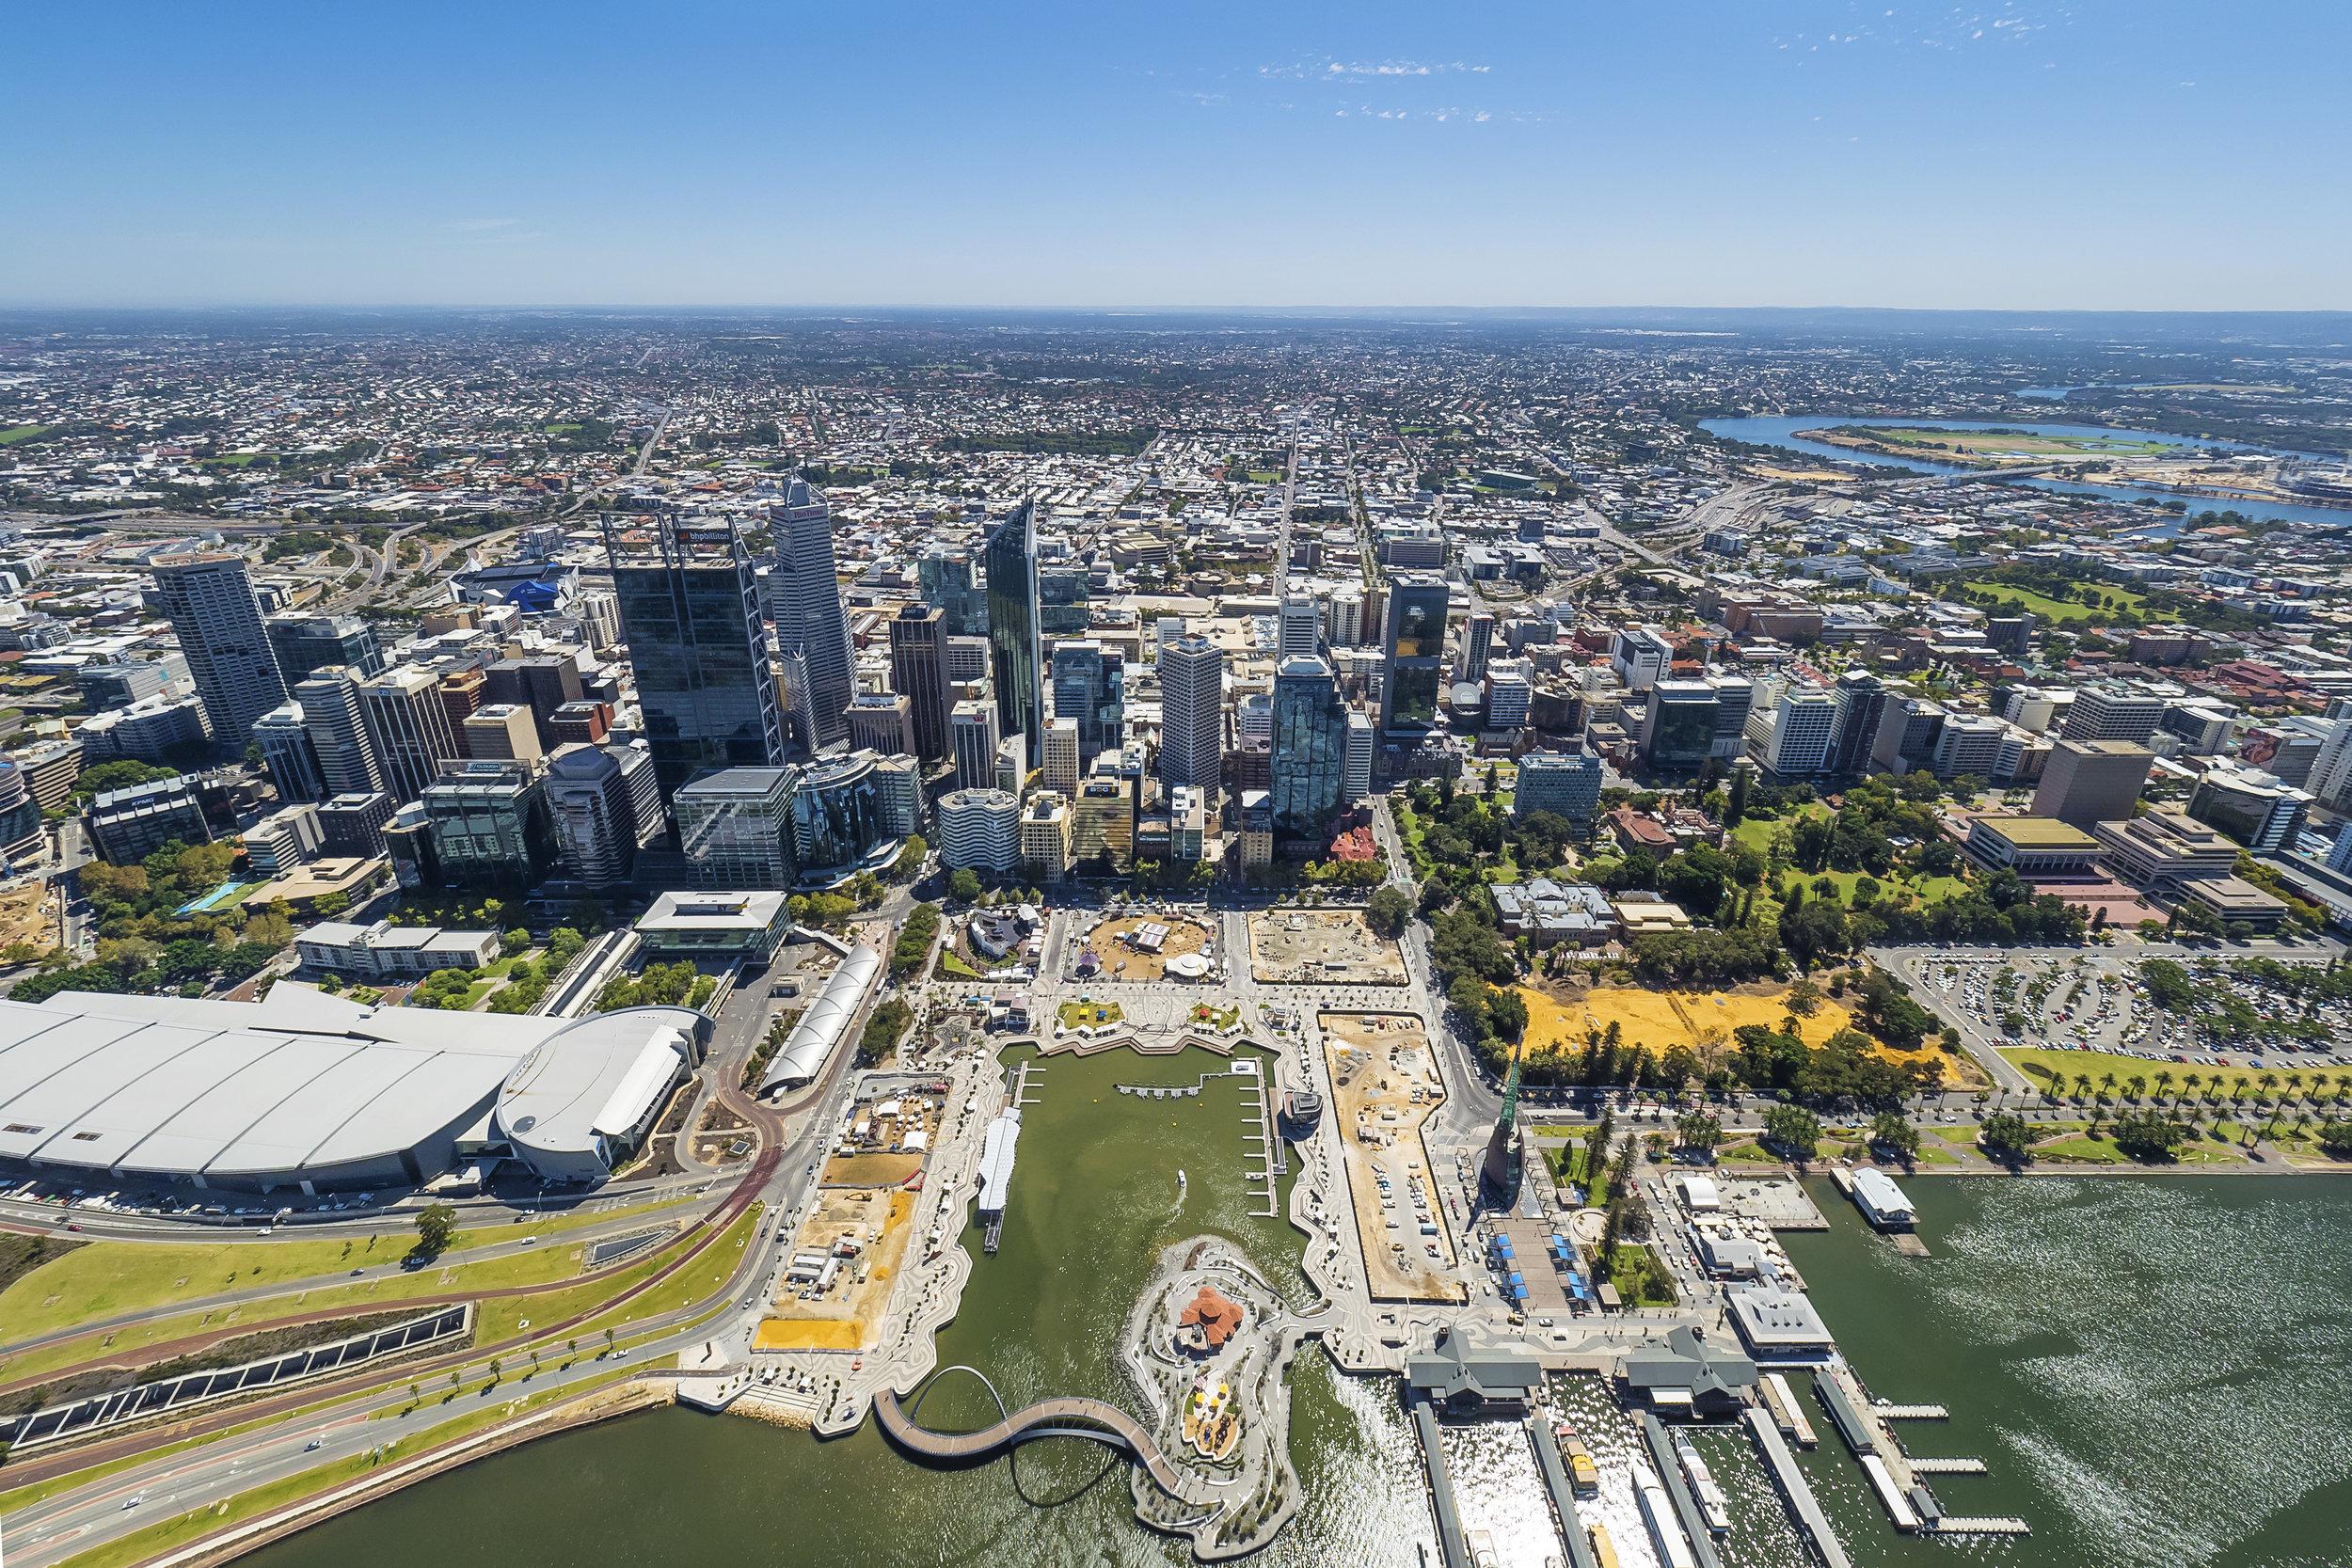 Aerial view of Elizabeth Quay, Perth